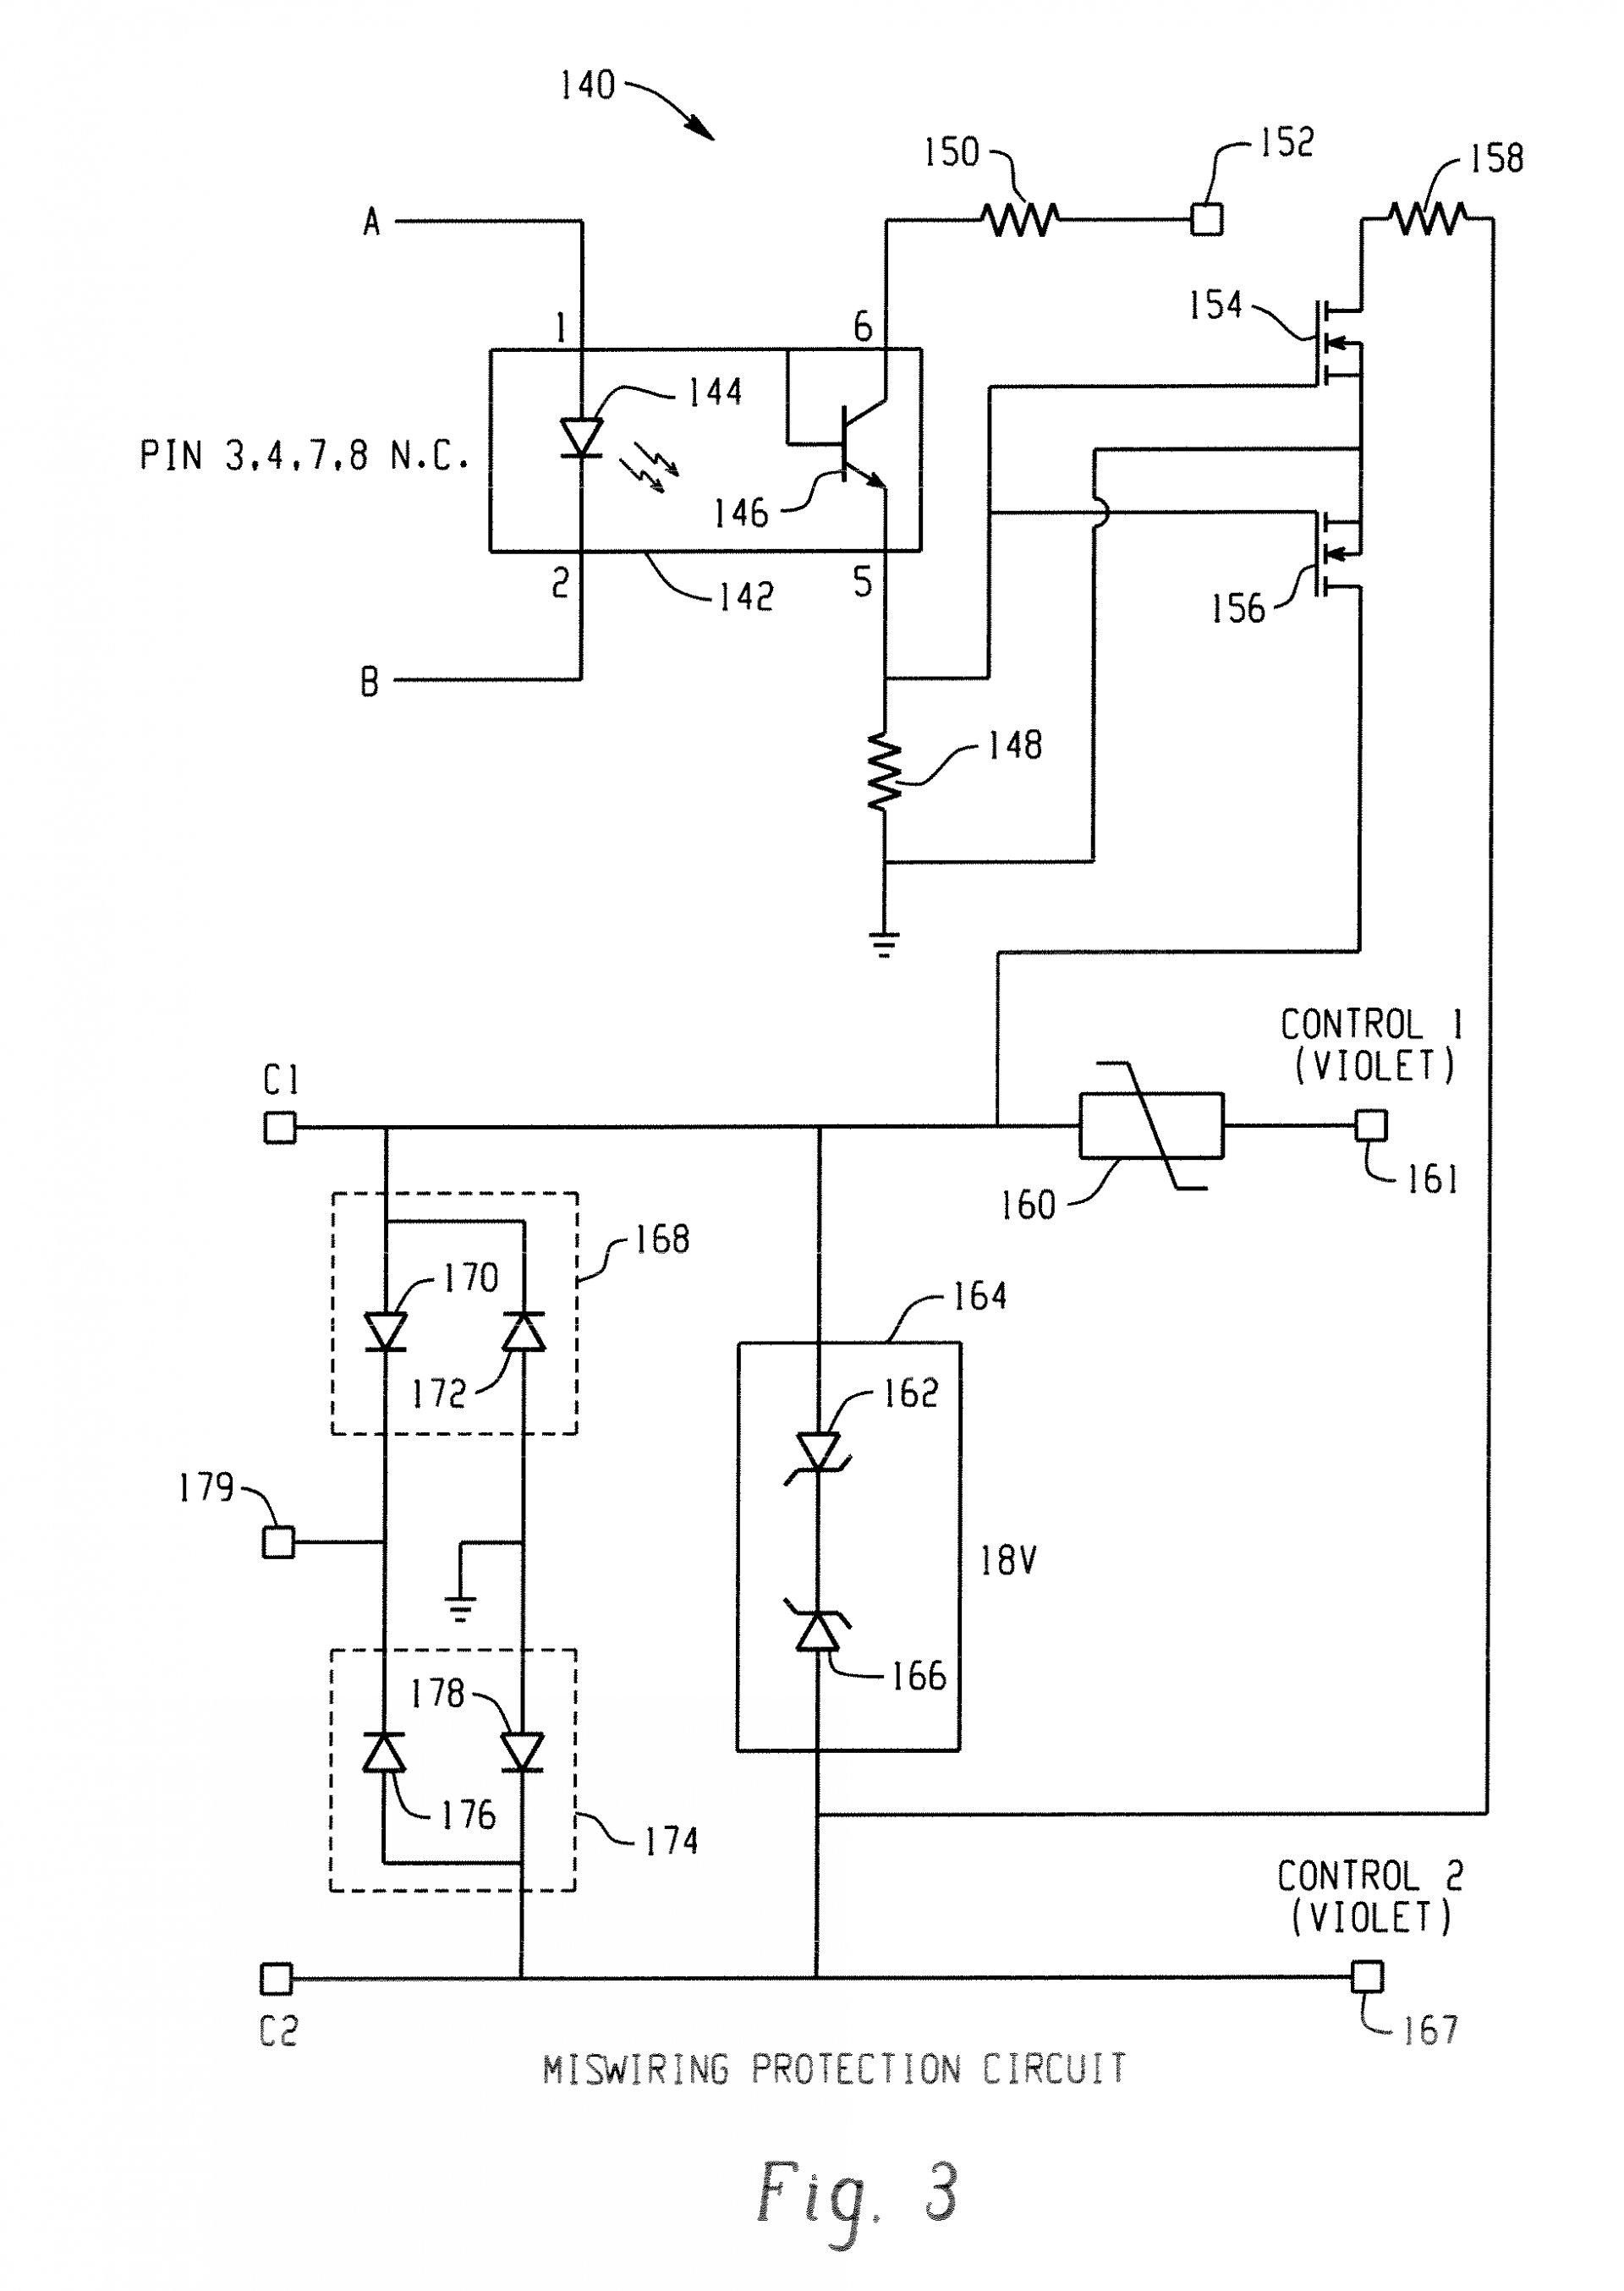 0 10 Volt Dimming Wiring Diagram | Wiring Diagram - 0-10 Volt Dimming Wiring Diagram